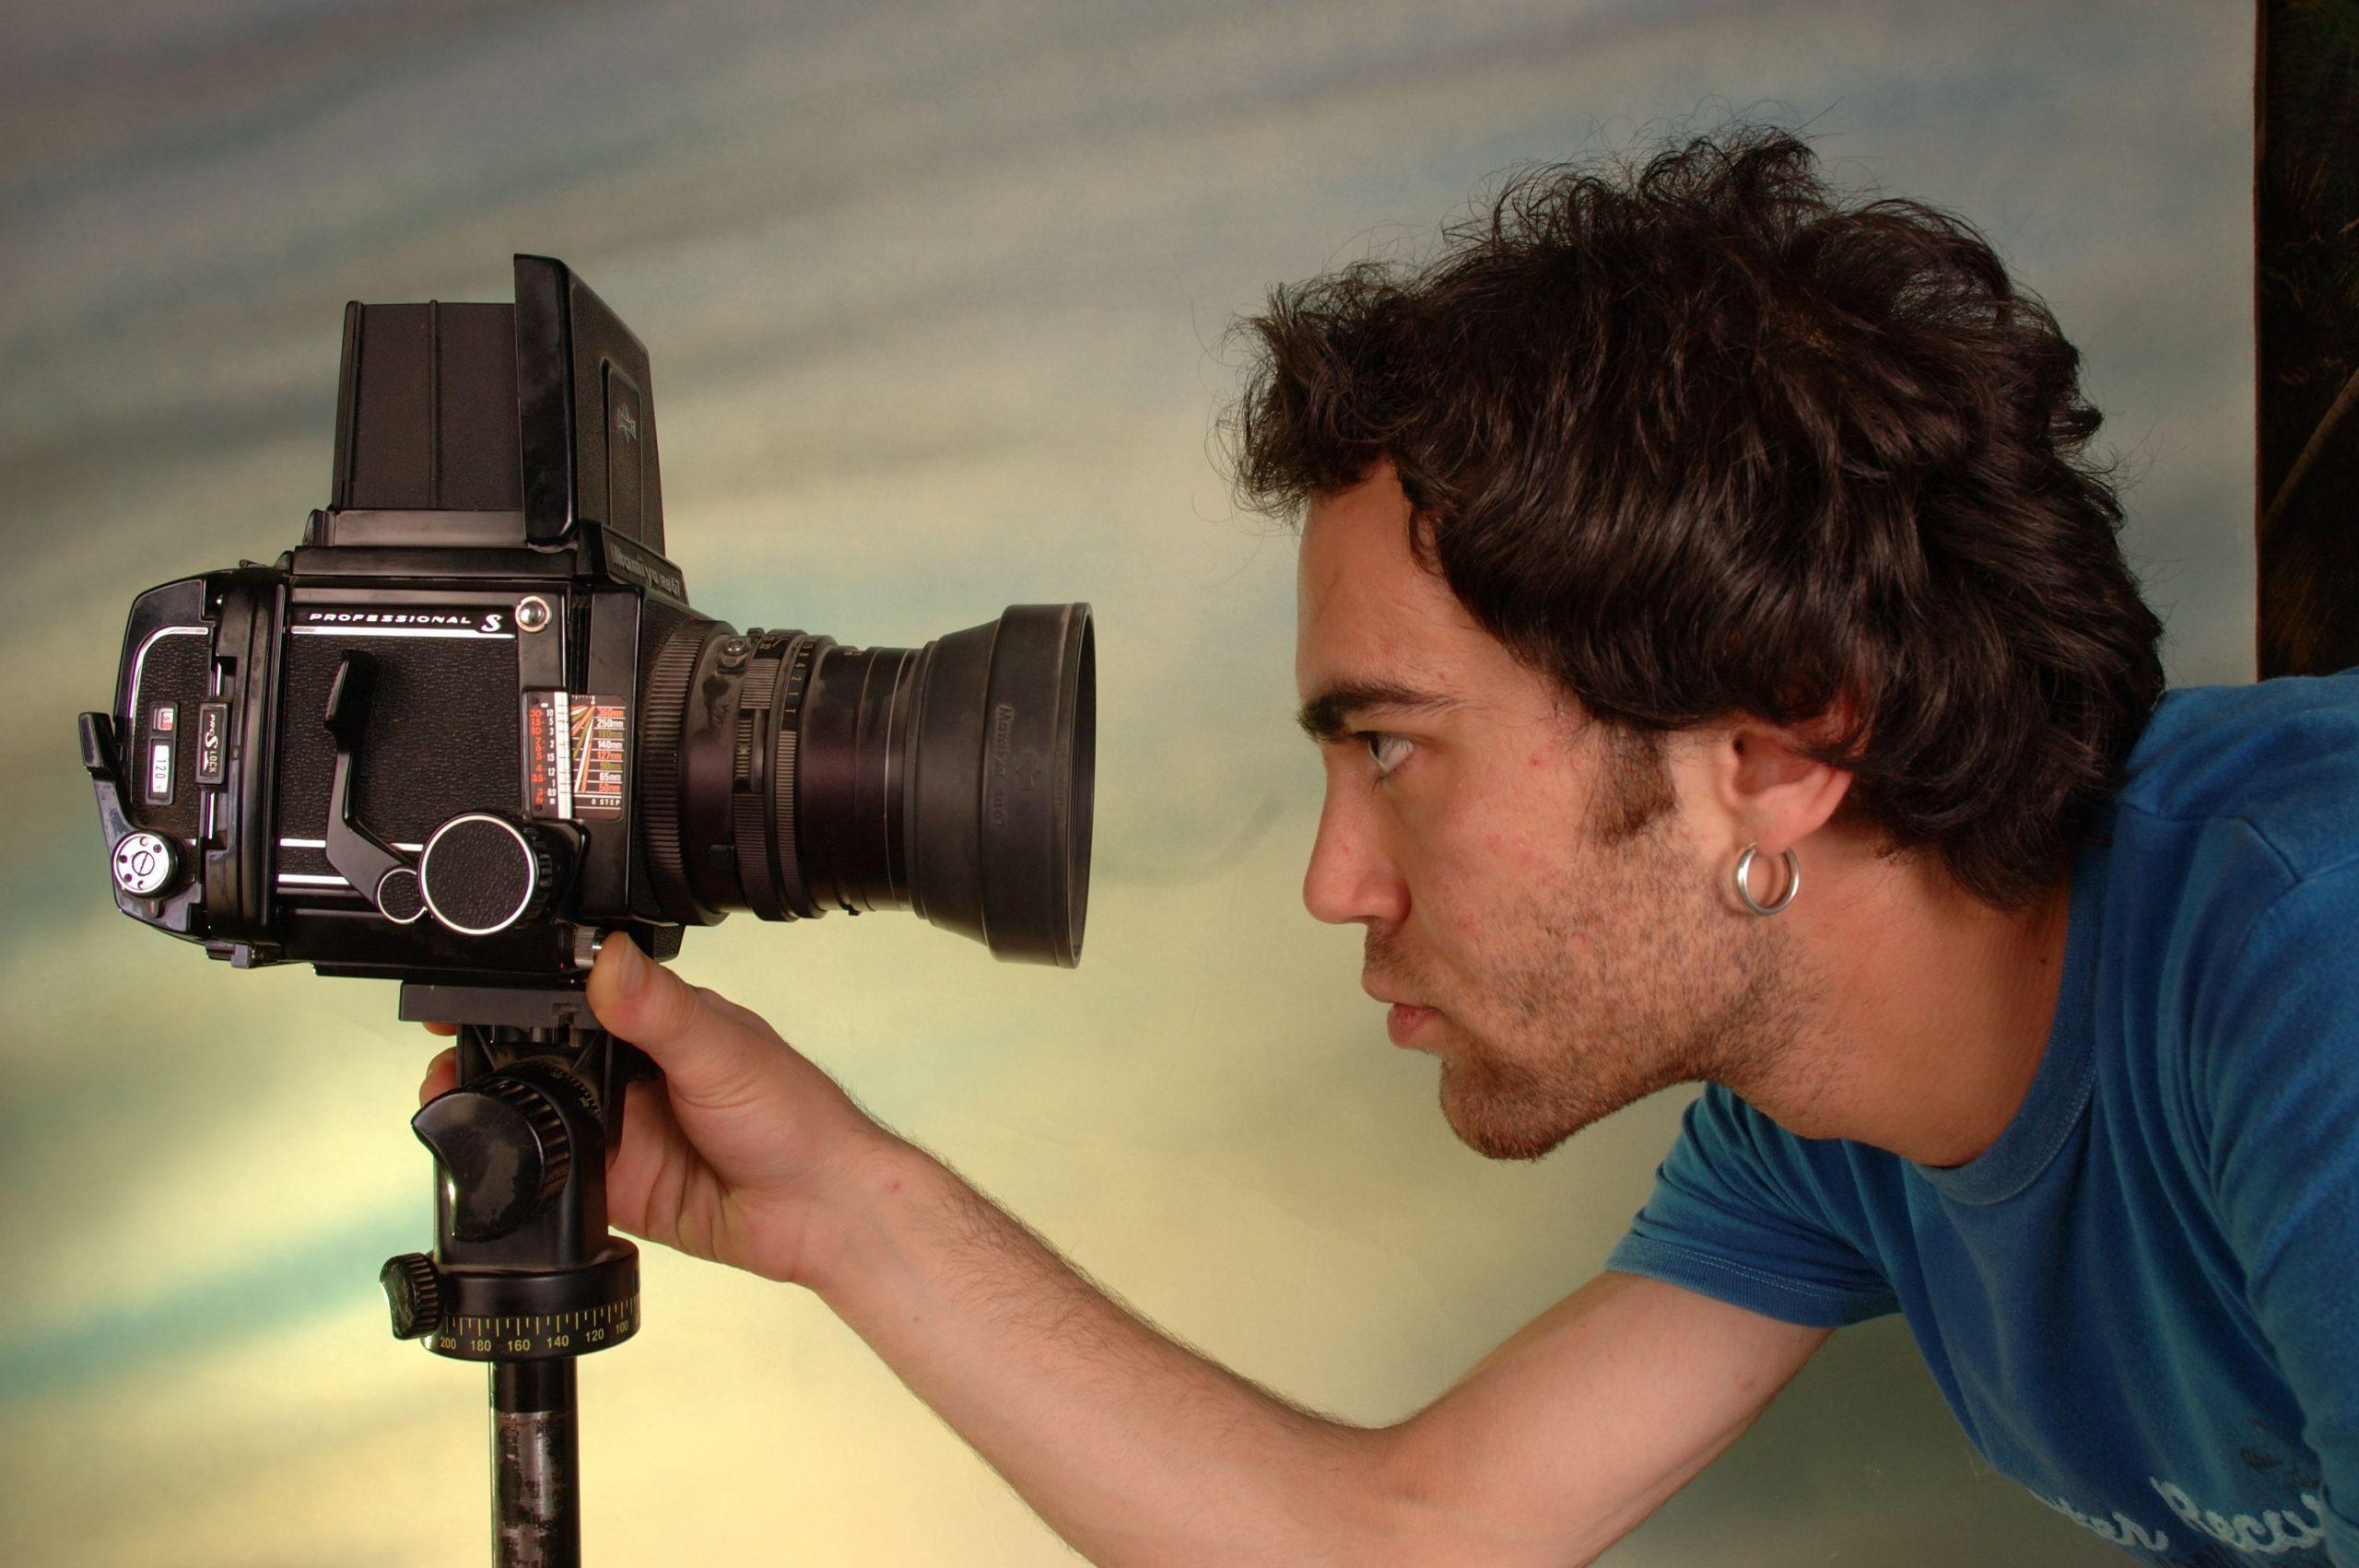 camera-1191286